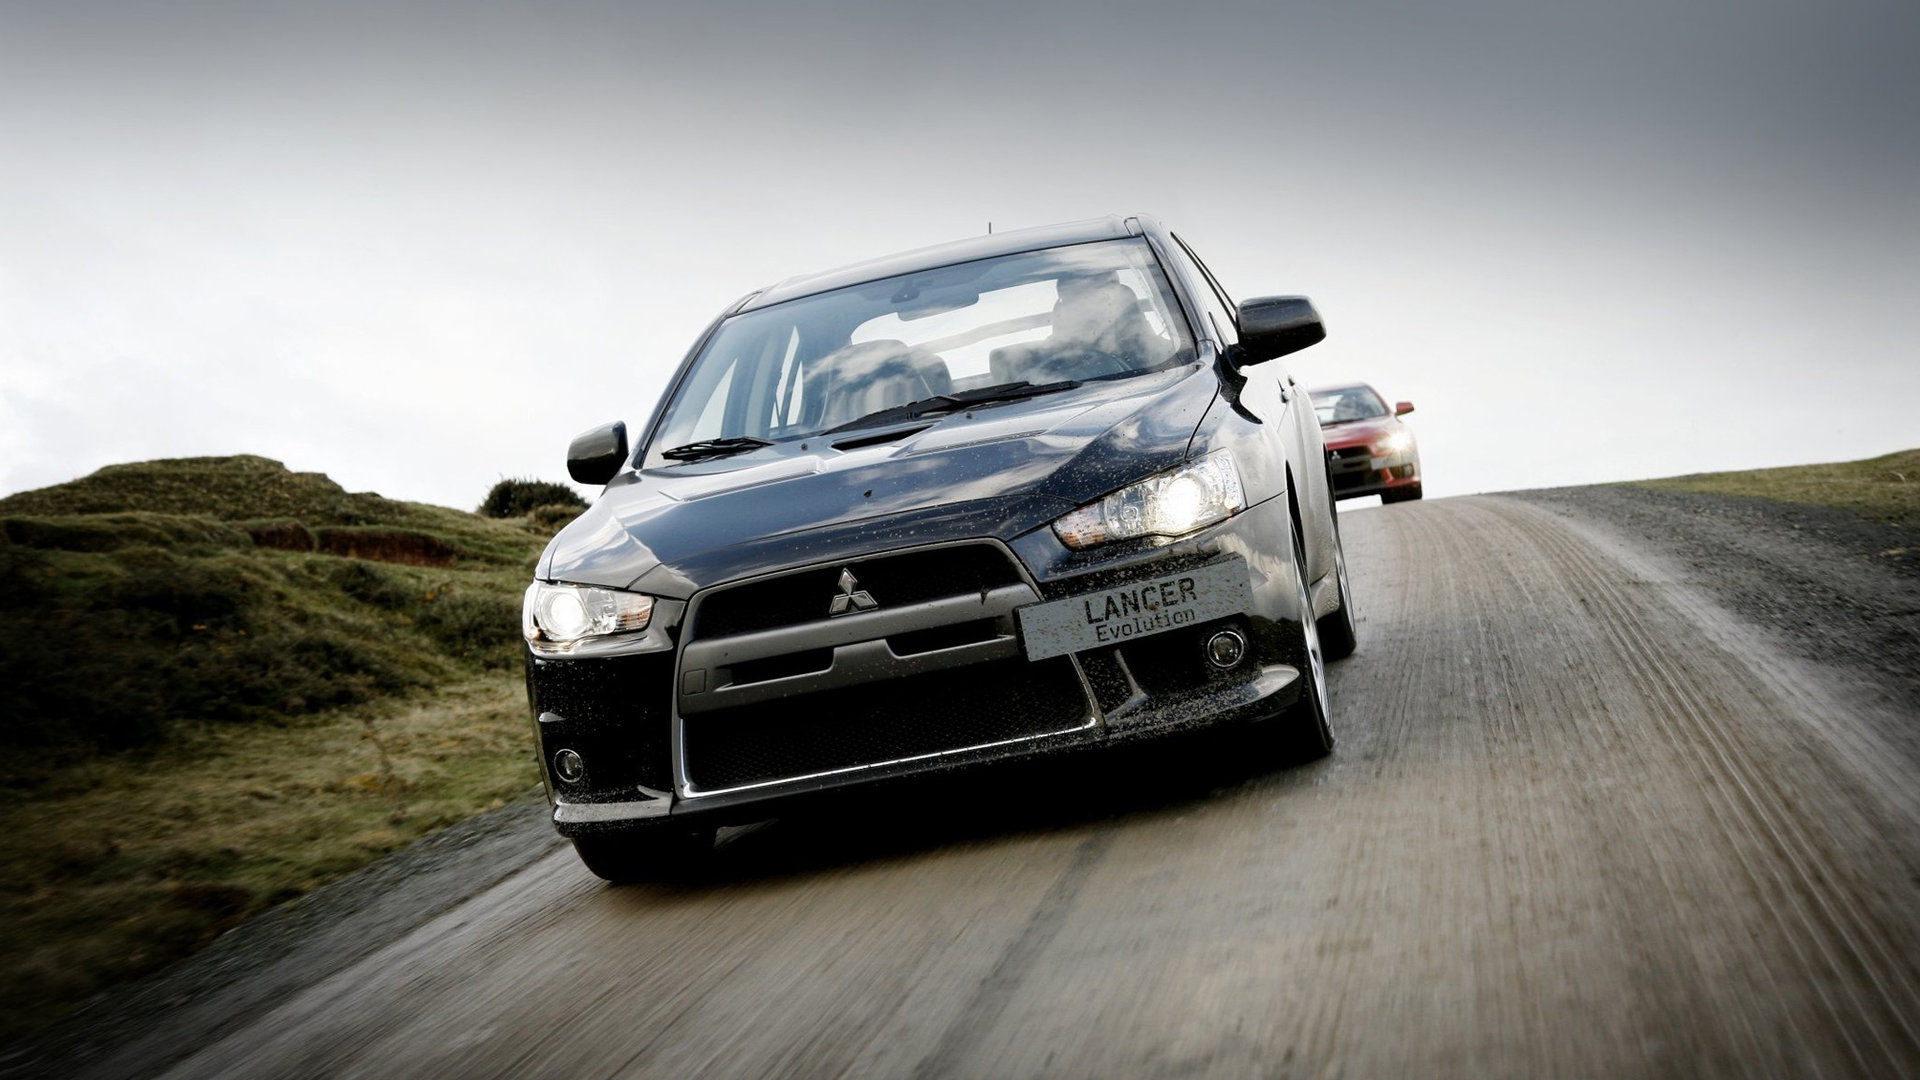 Coche del día: Mitsubishi Lancer Evo X